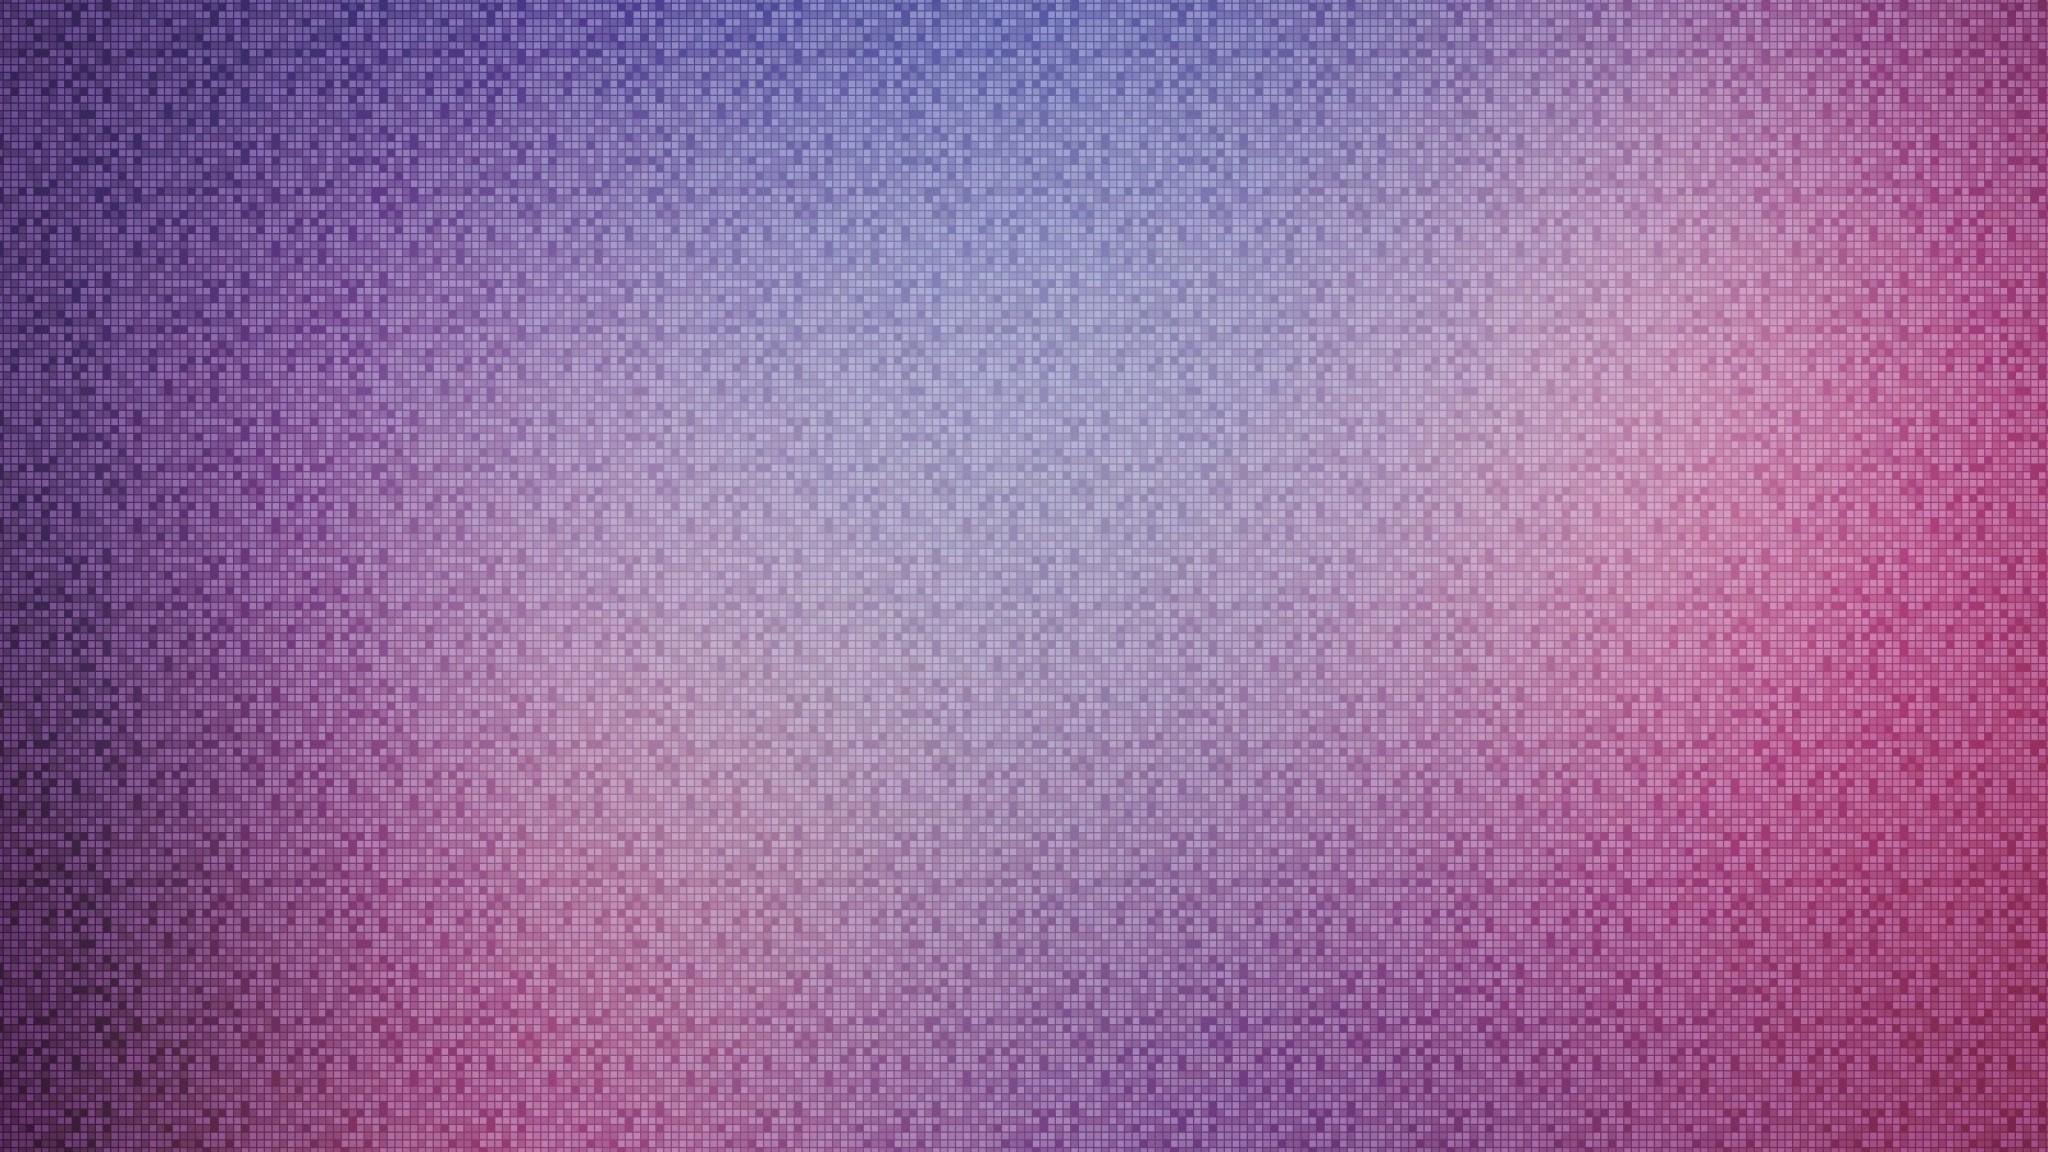 Wallpaper background, pattern, pixels, shadow